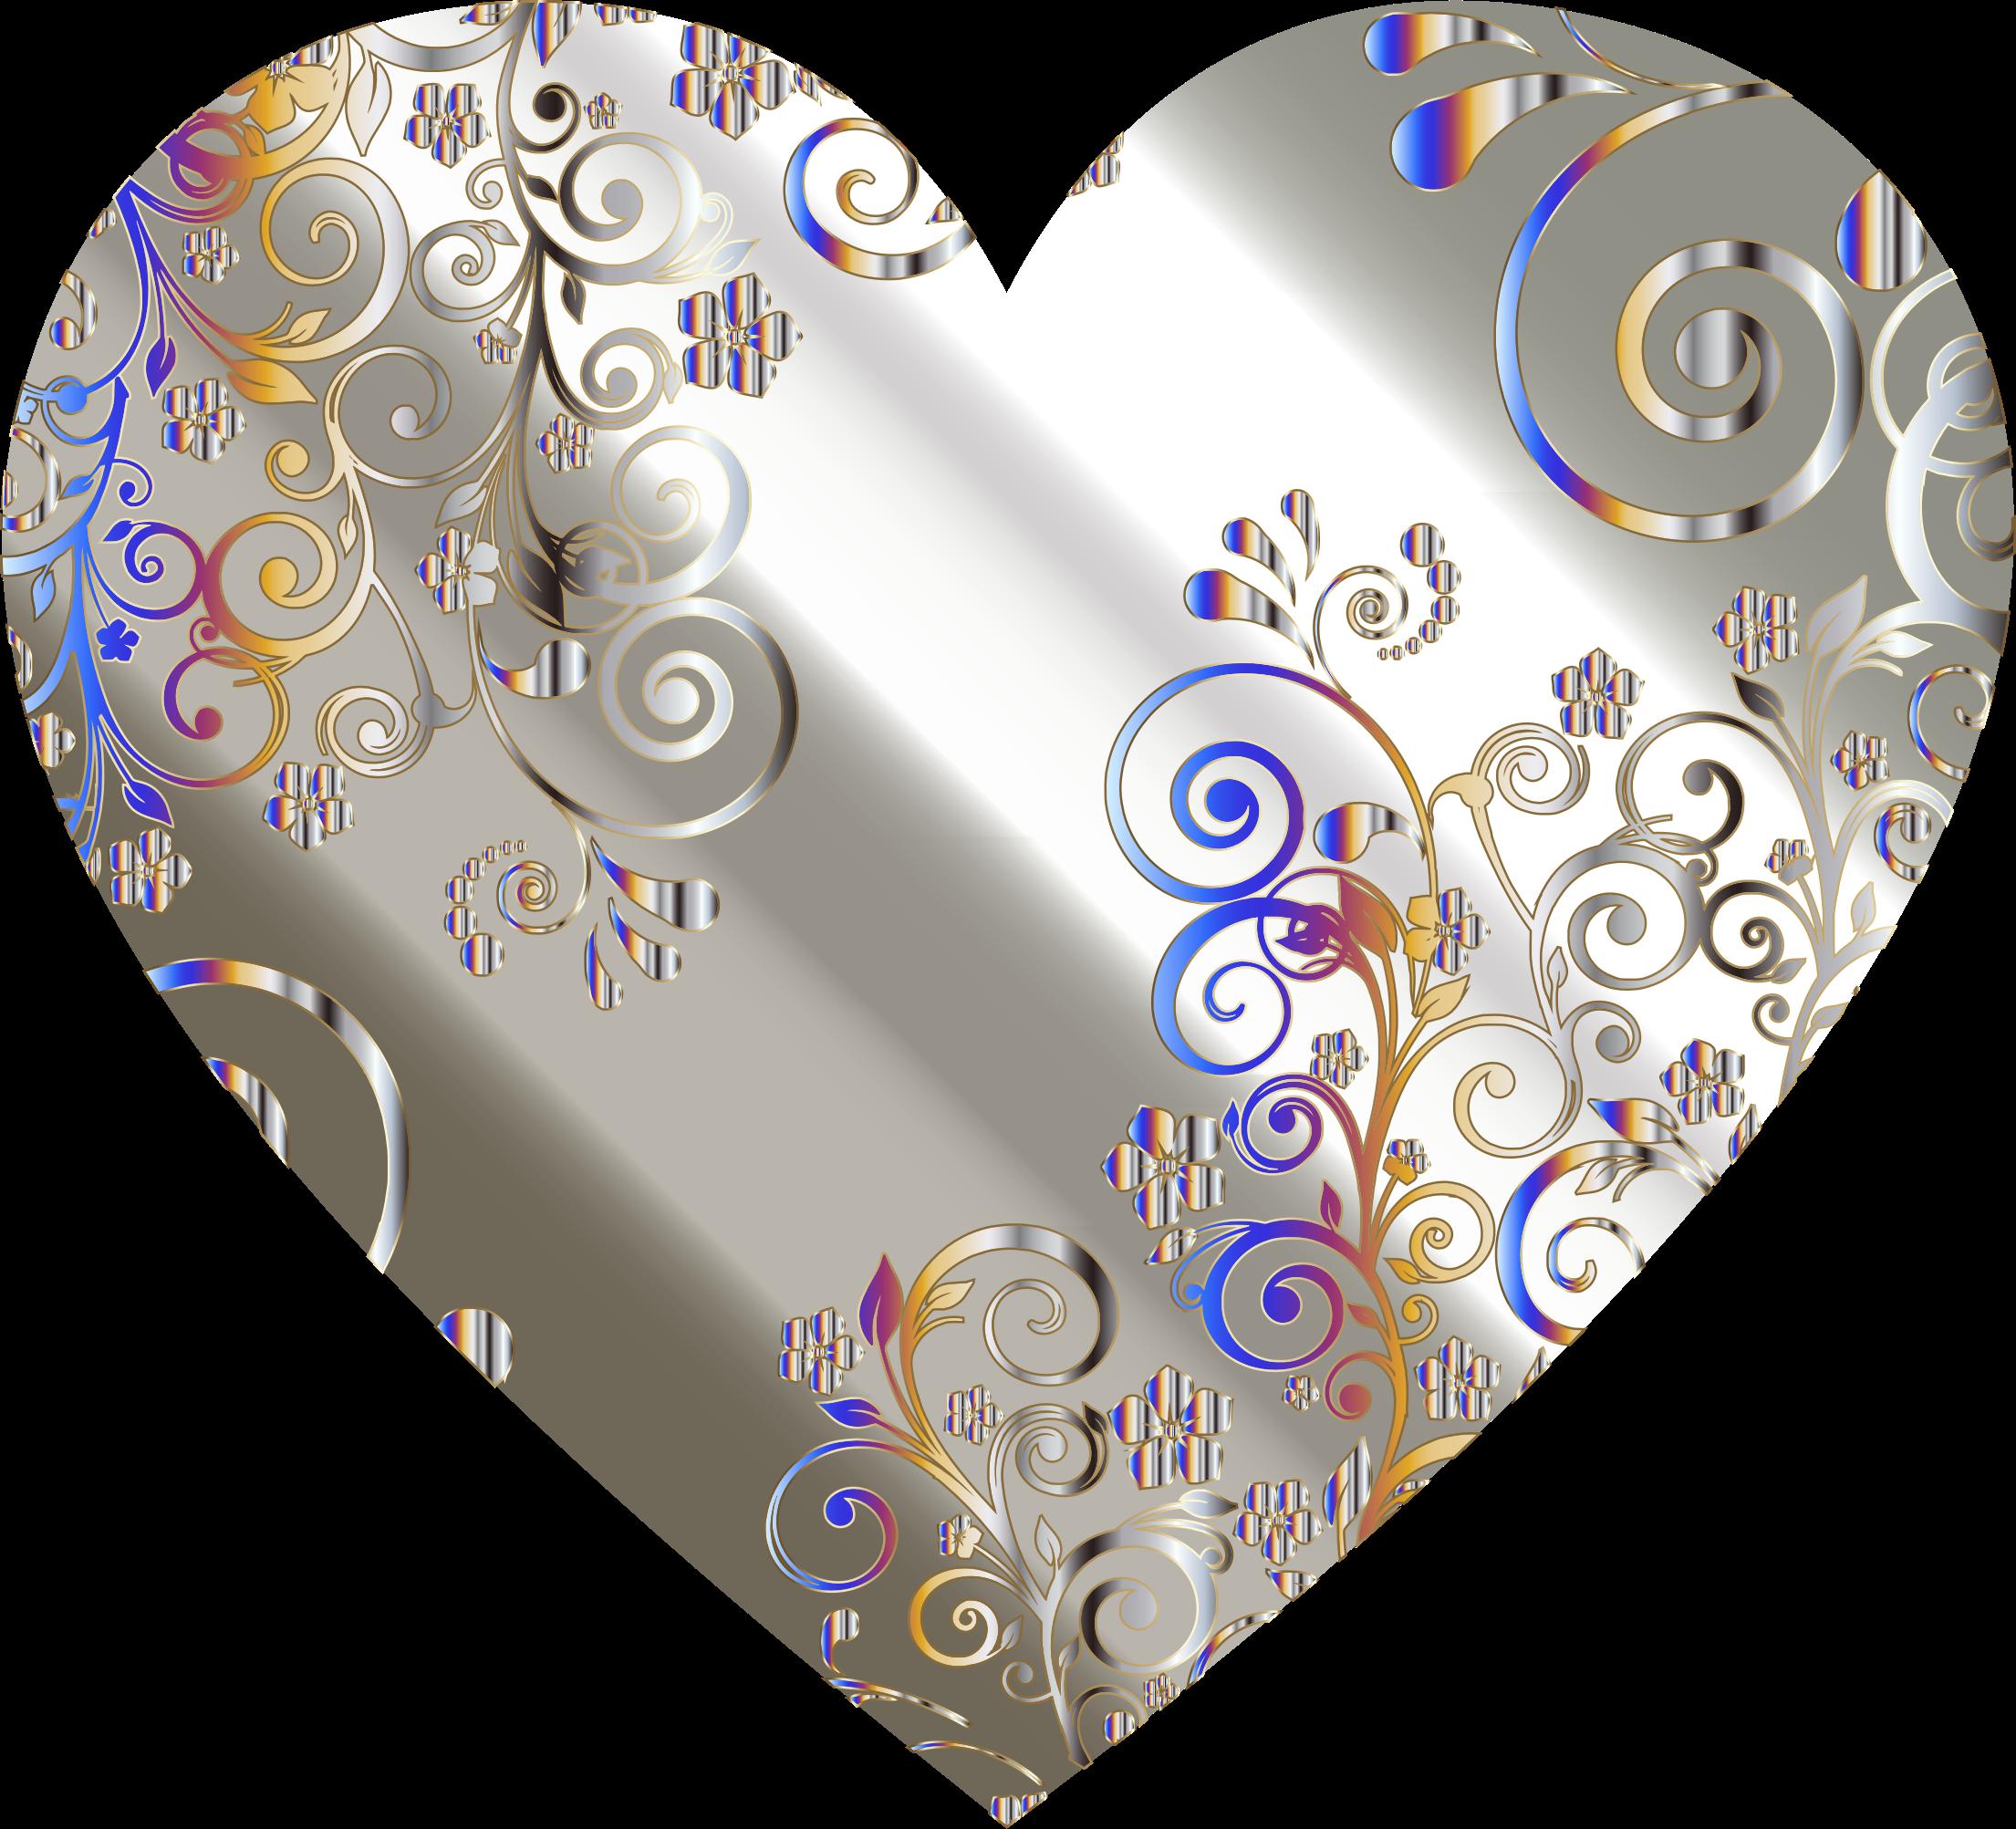 Paisley heart clipart free Clipart - Prismatic Floral Flourish Heart 8 free